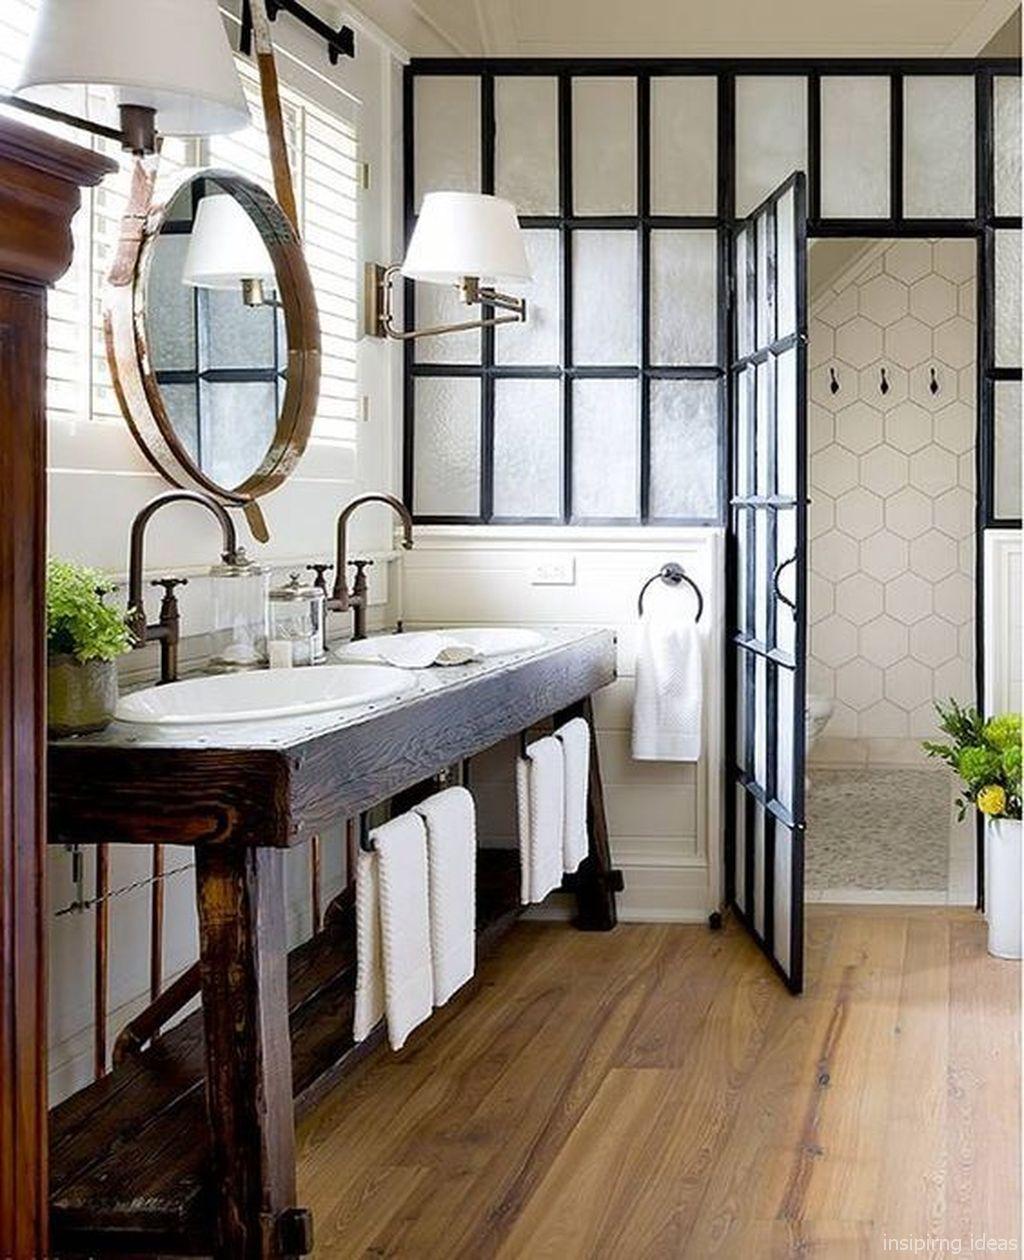 54 Awesome Modern Farmhouse Bathroom Vanity Ideas